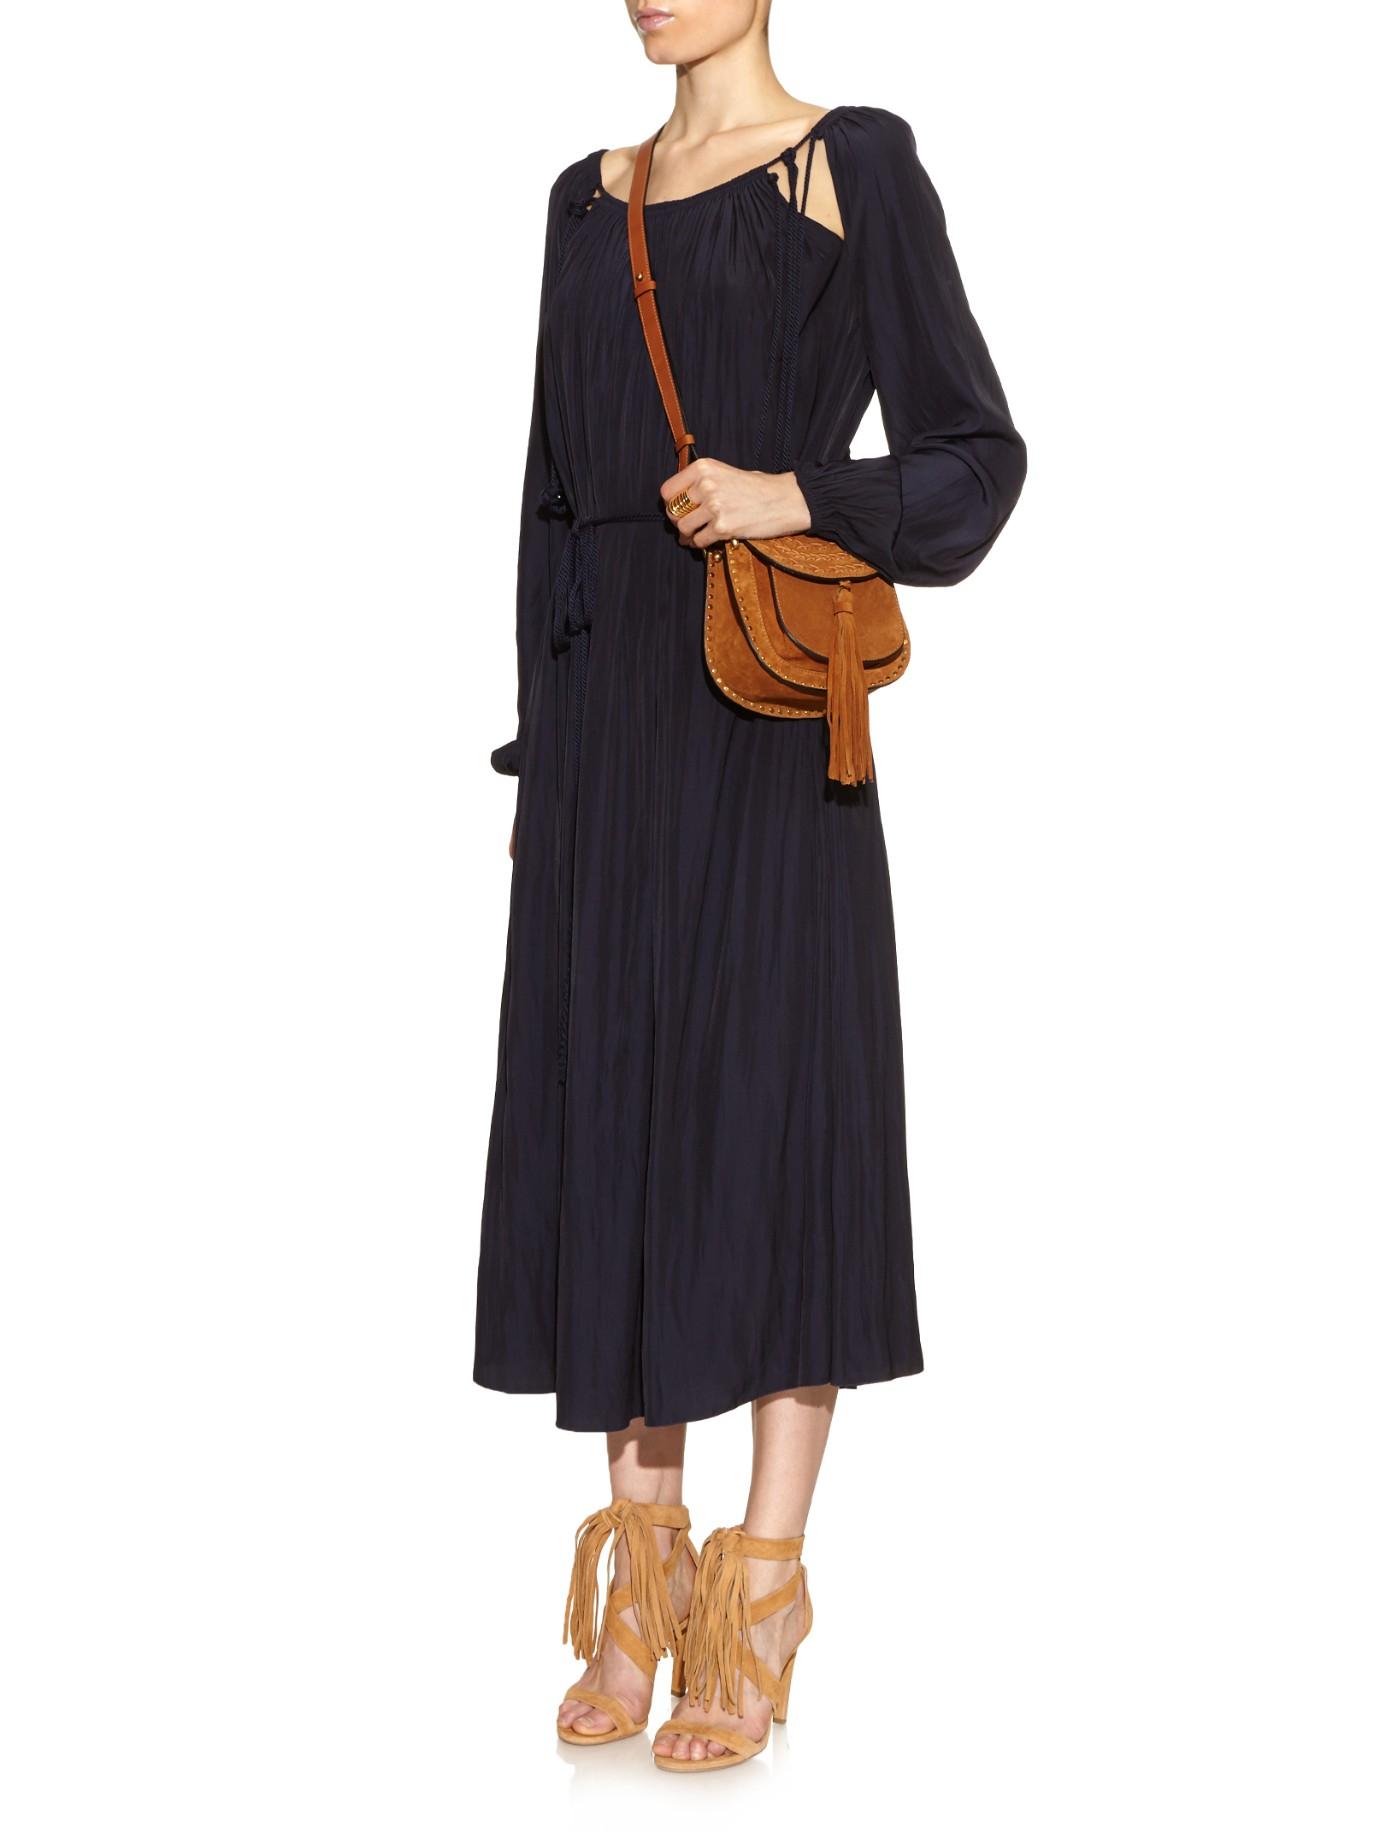 chloe paraty replica - Chlo�� Hudson Mini Suede Cross-Body Bag in Brown (TAN) | Lyst